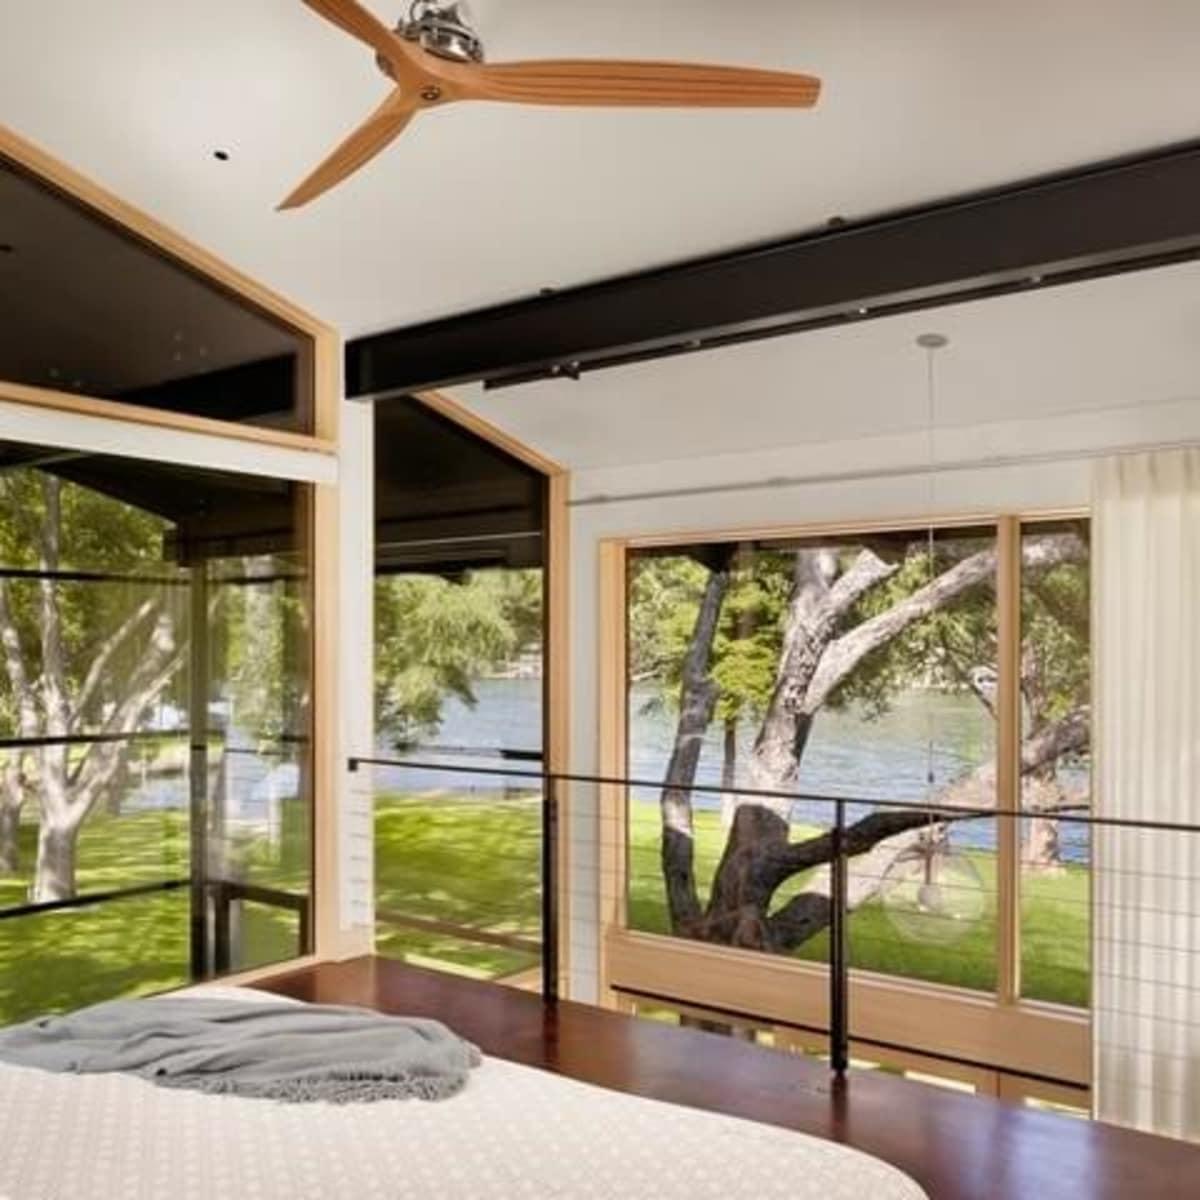 Austin house home Houzz modern Lake Austin bedroom